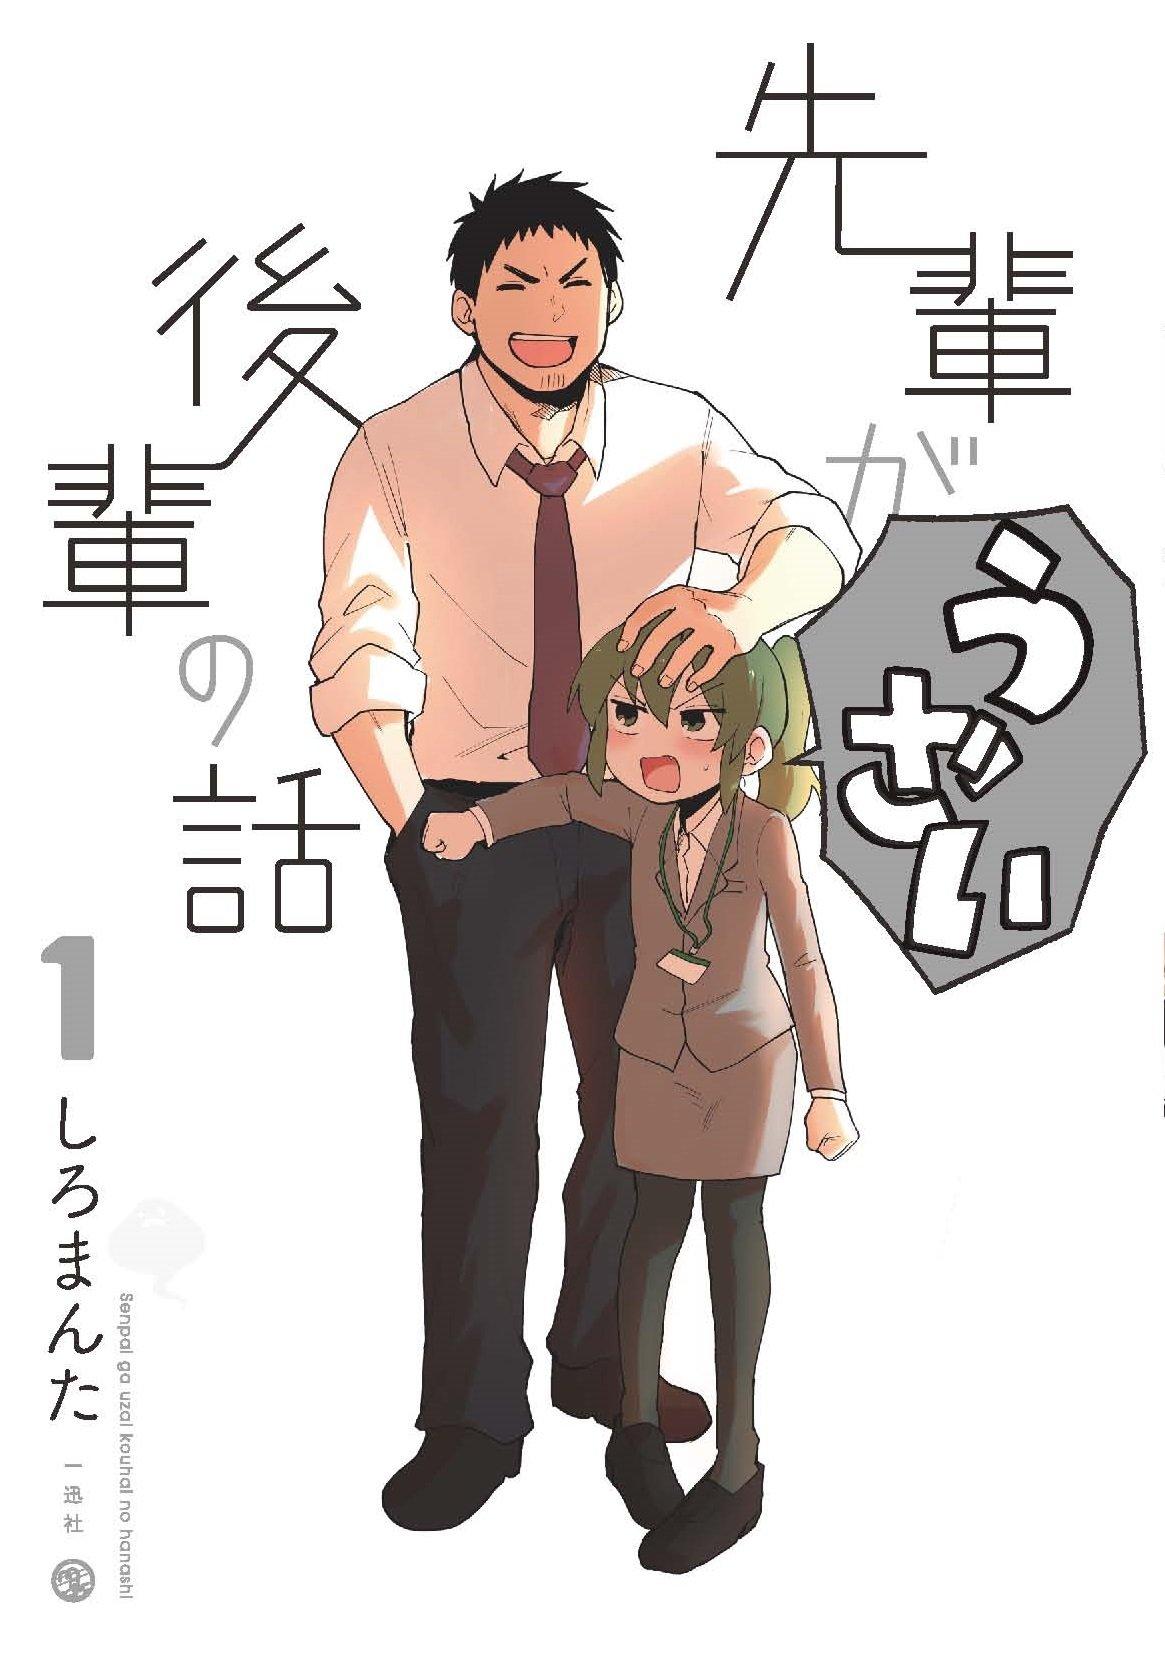 Webマンガ部門第1位を獲得した大人気コミックス『先輩がうざい後輩の話』アニメ化決定!